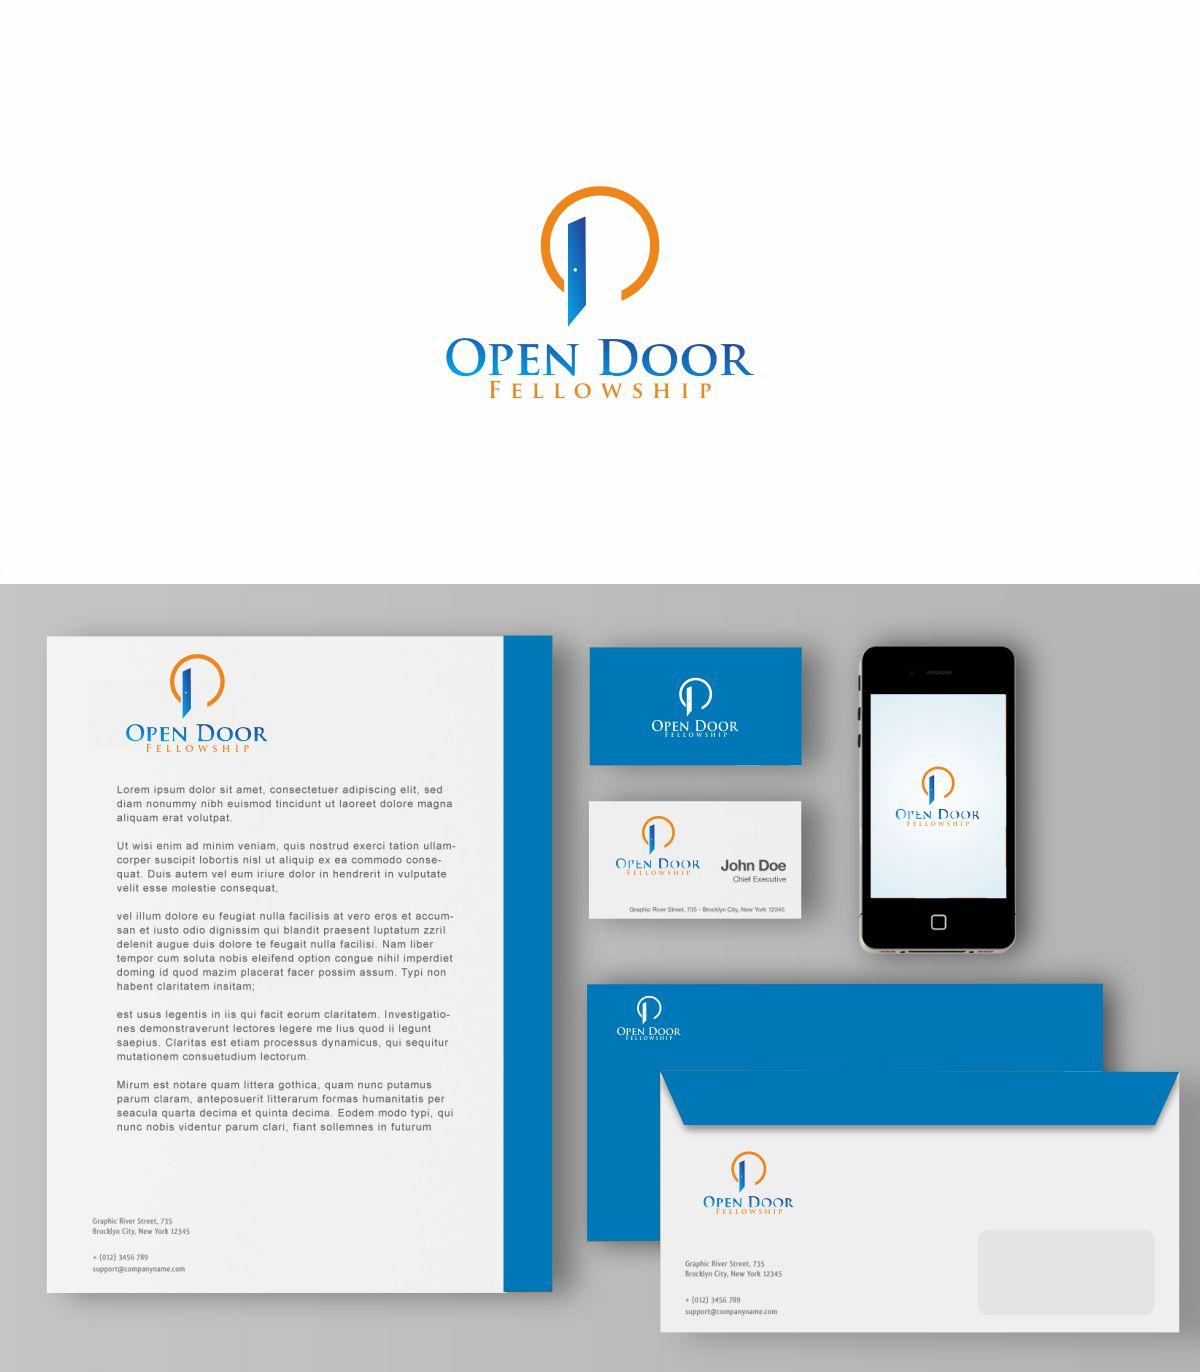 Logo Design by Pauljohnny for Open Door Fellowship - Relaunch Logo - Design #12427198  sc 1 st  DesignCrowd & Bold Modern Logo Design for Open Door Fellowship by Pauljohnny ...